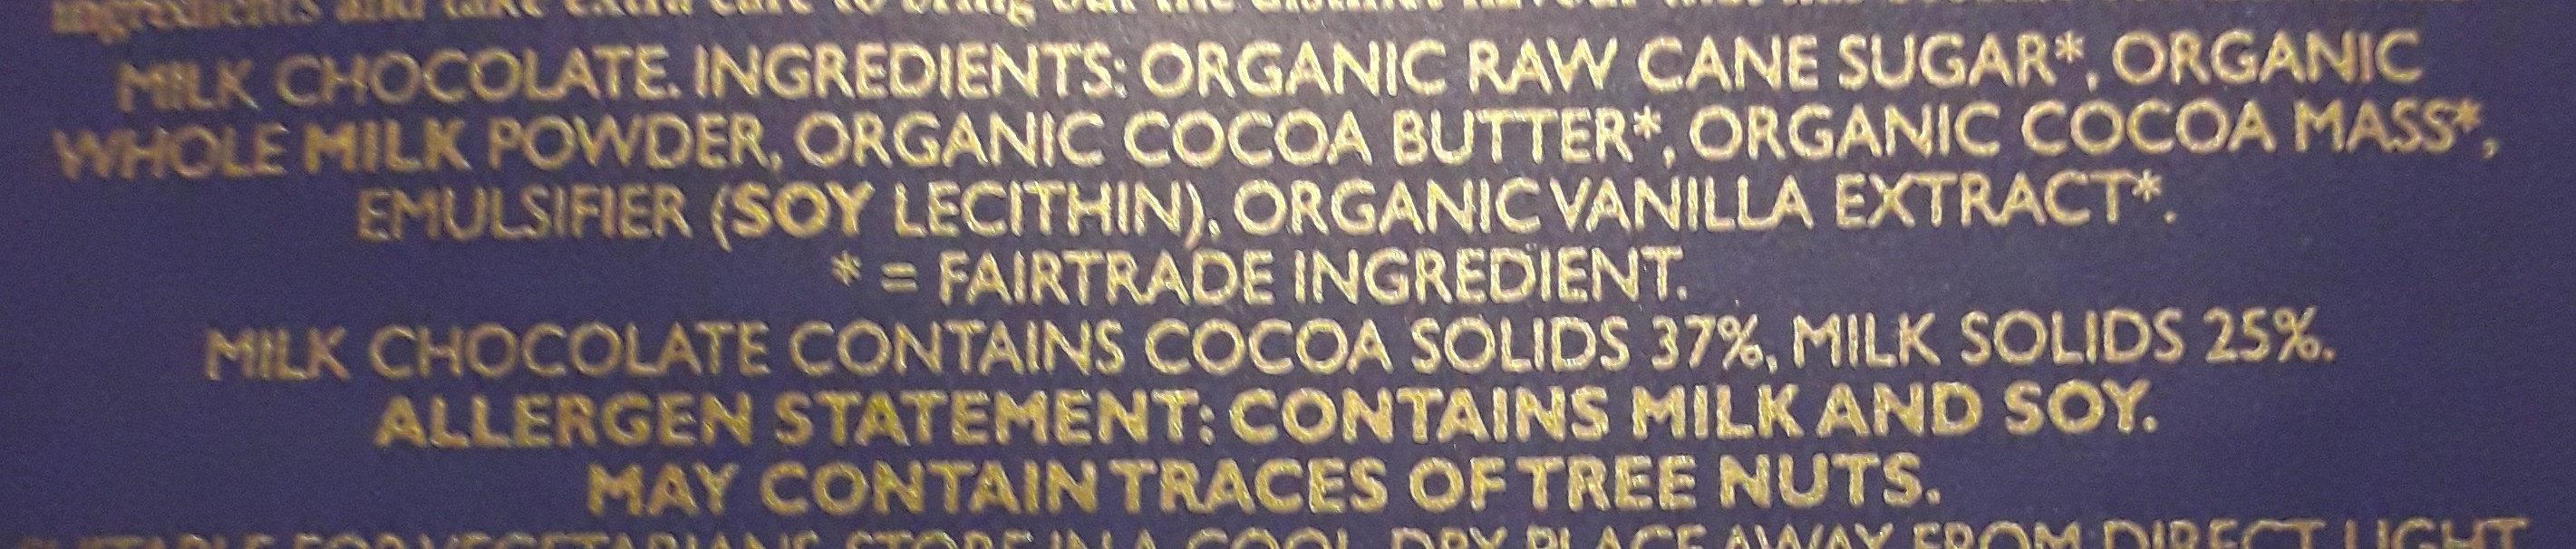 Green & Black's Organic Milk Chocolate - Ingrediënten - en